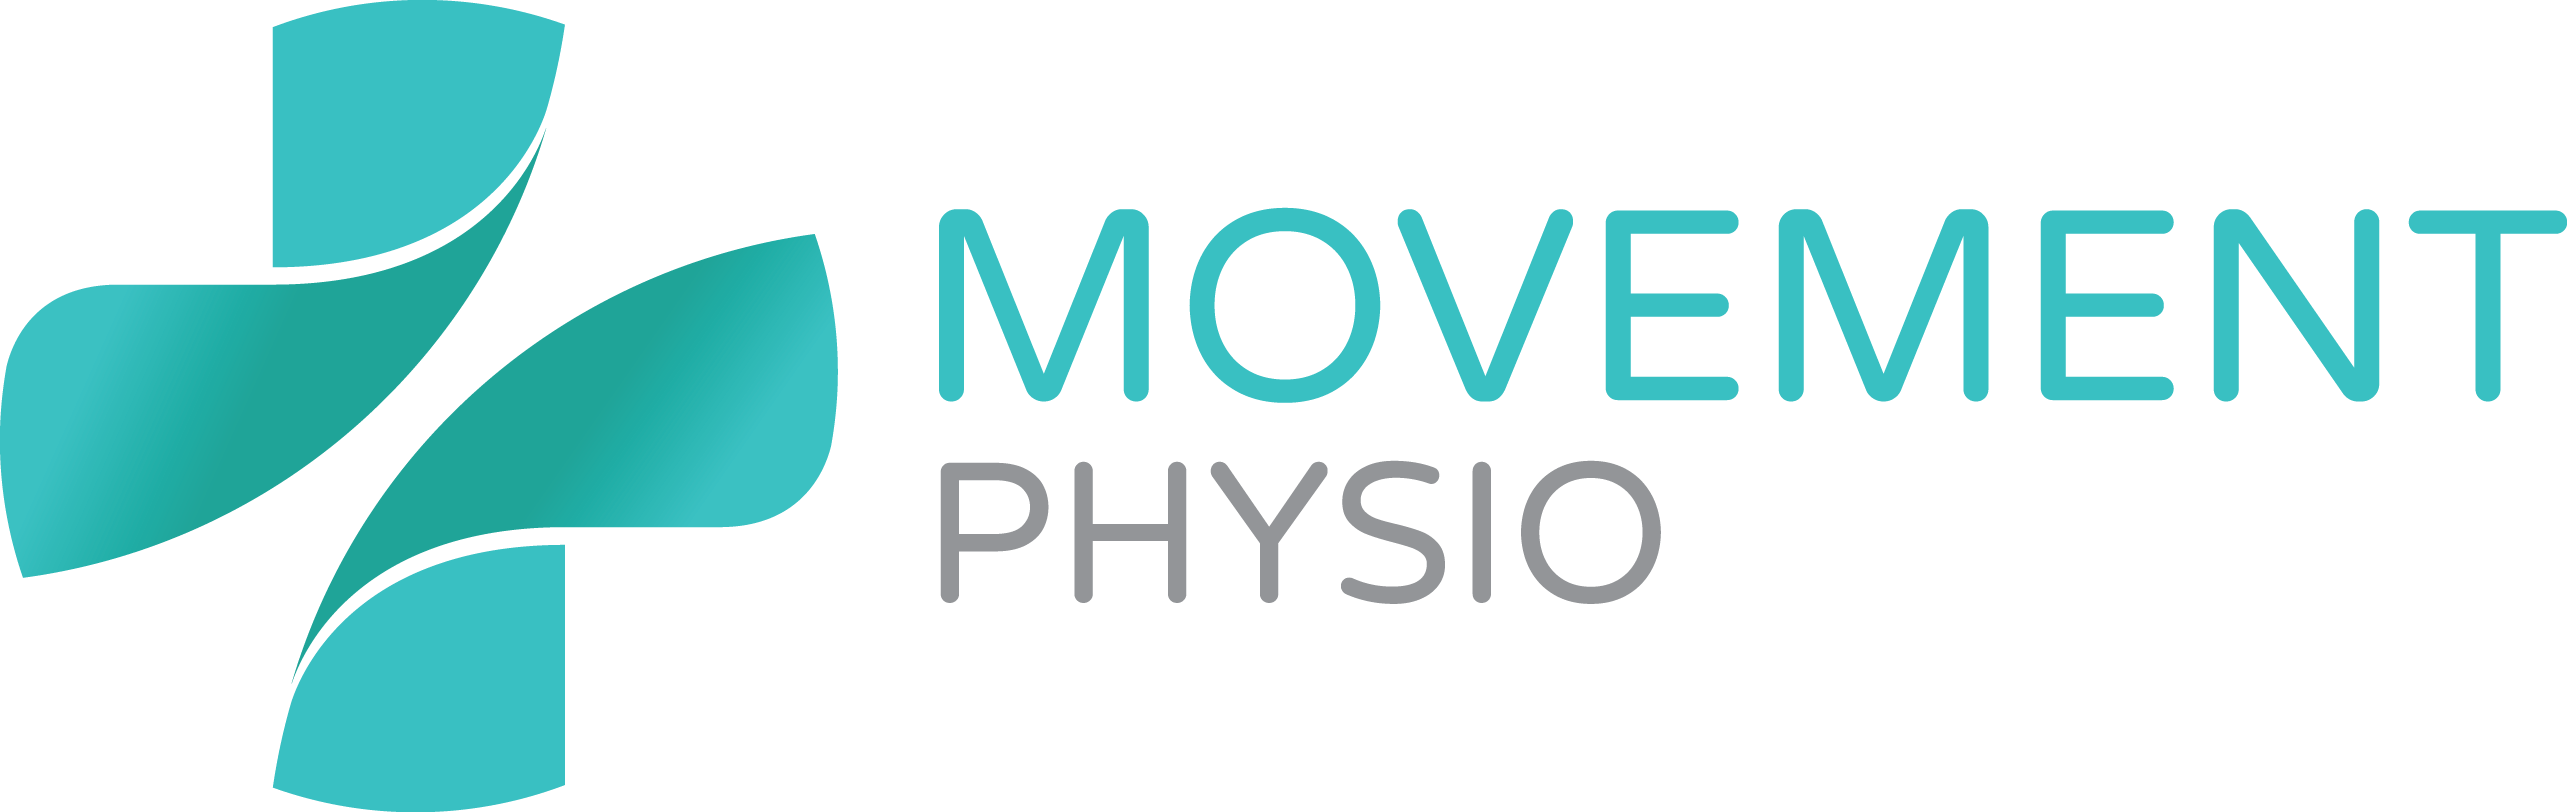 movement physio, s.r.o.